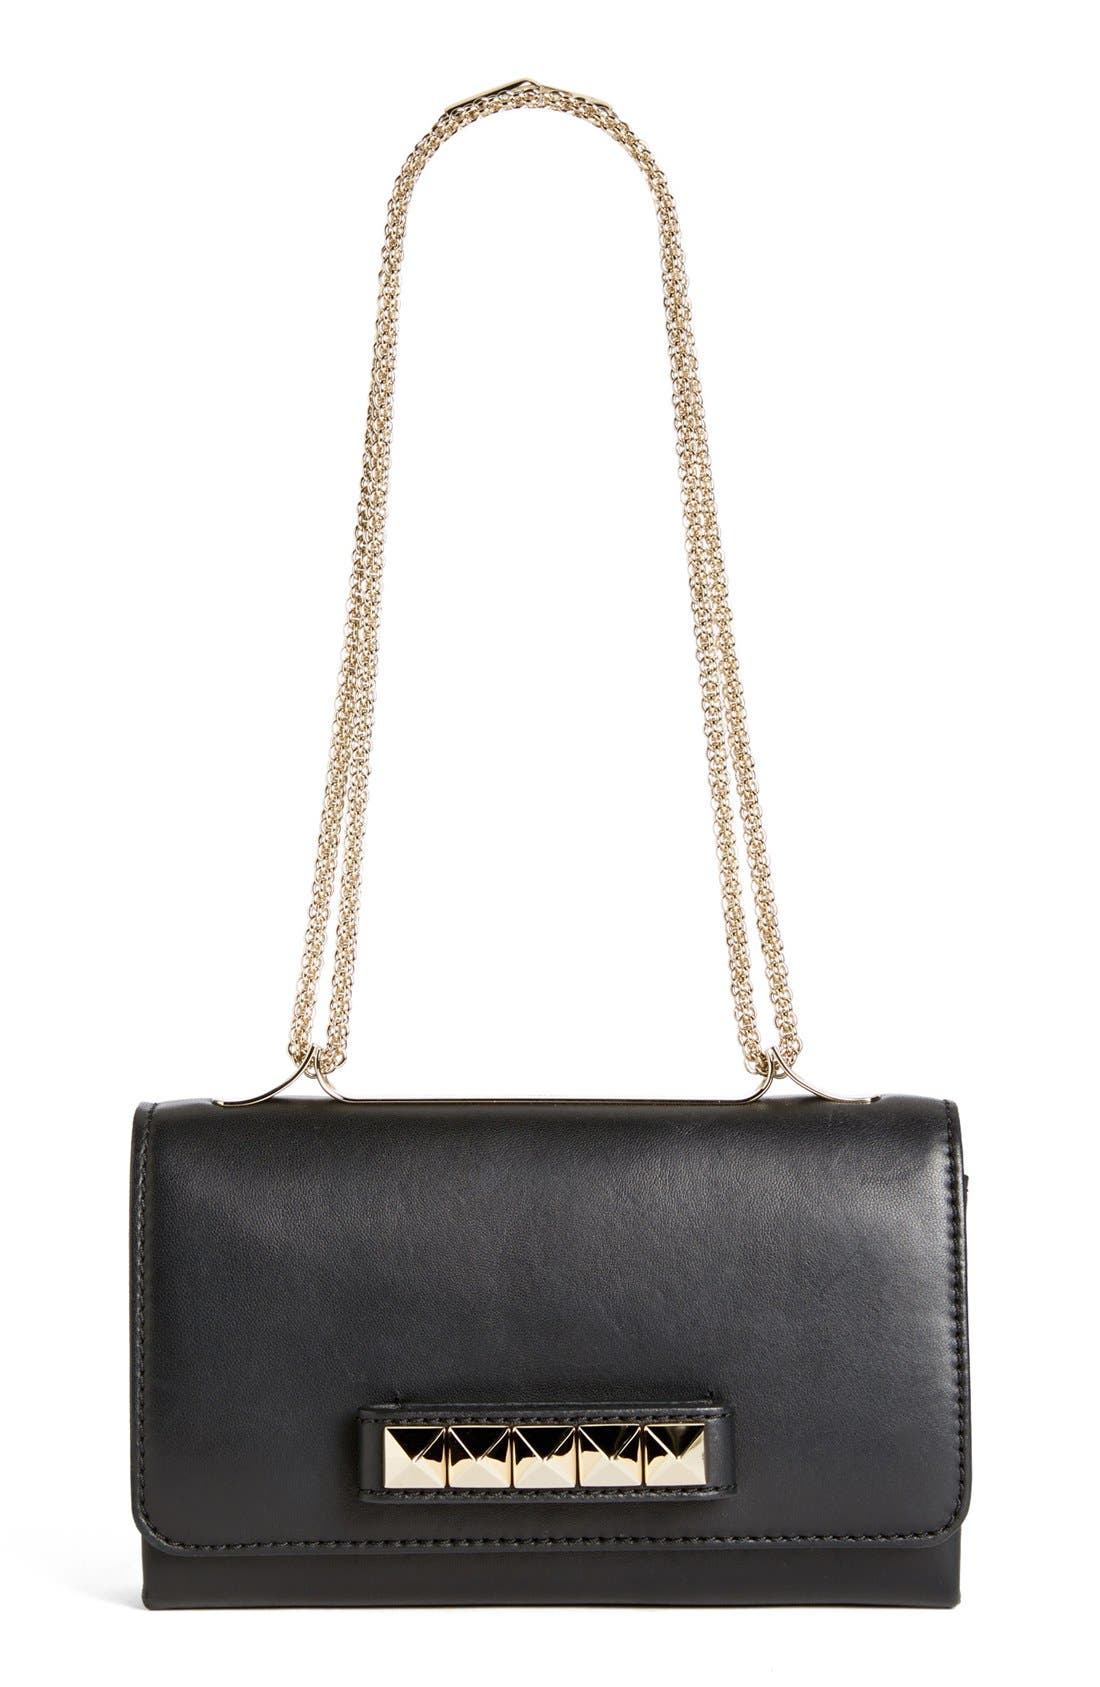 Alternate Image 1 Selected - Valentino 'Va Va Voom' Nappa Leather Shoulder Bag